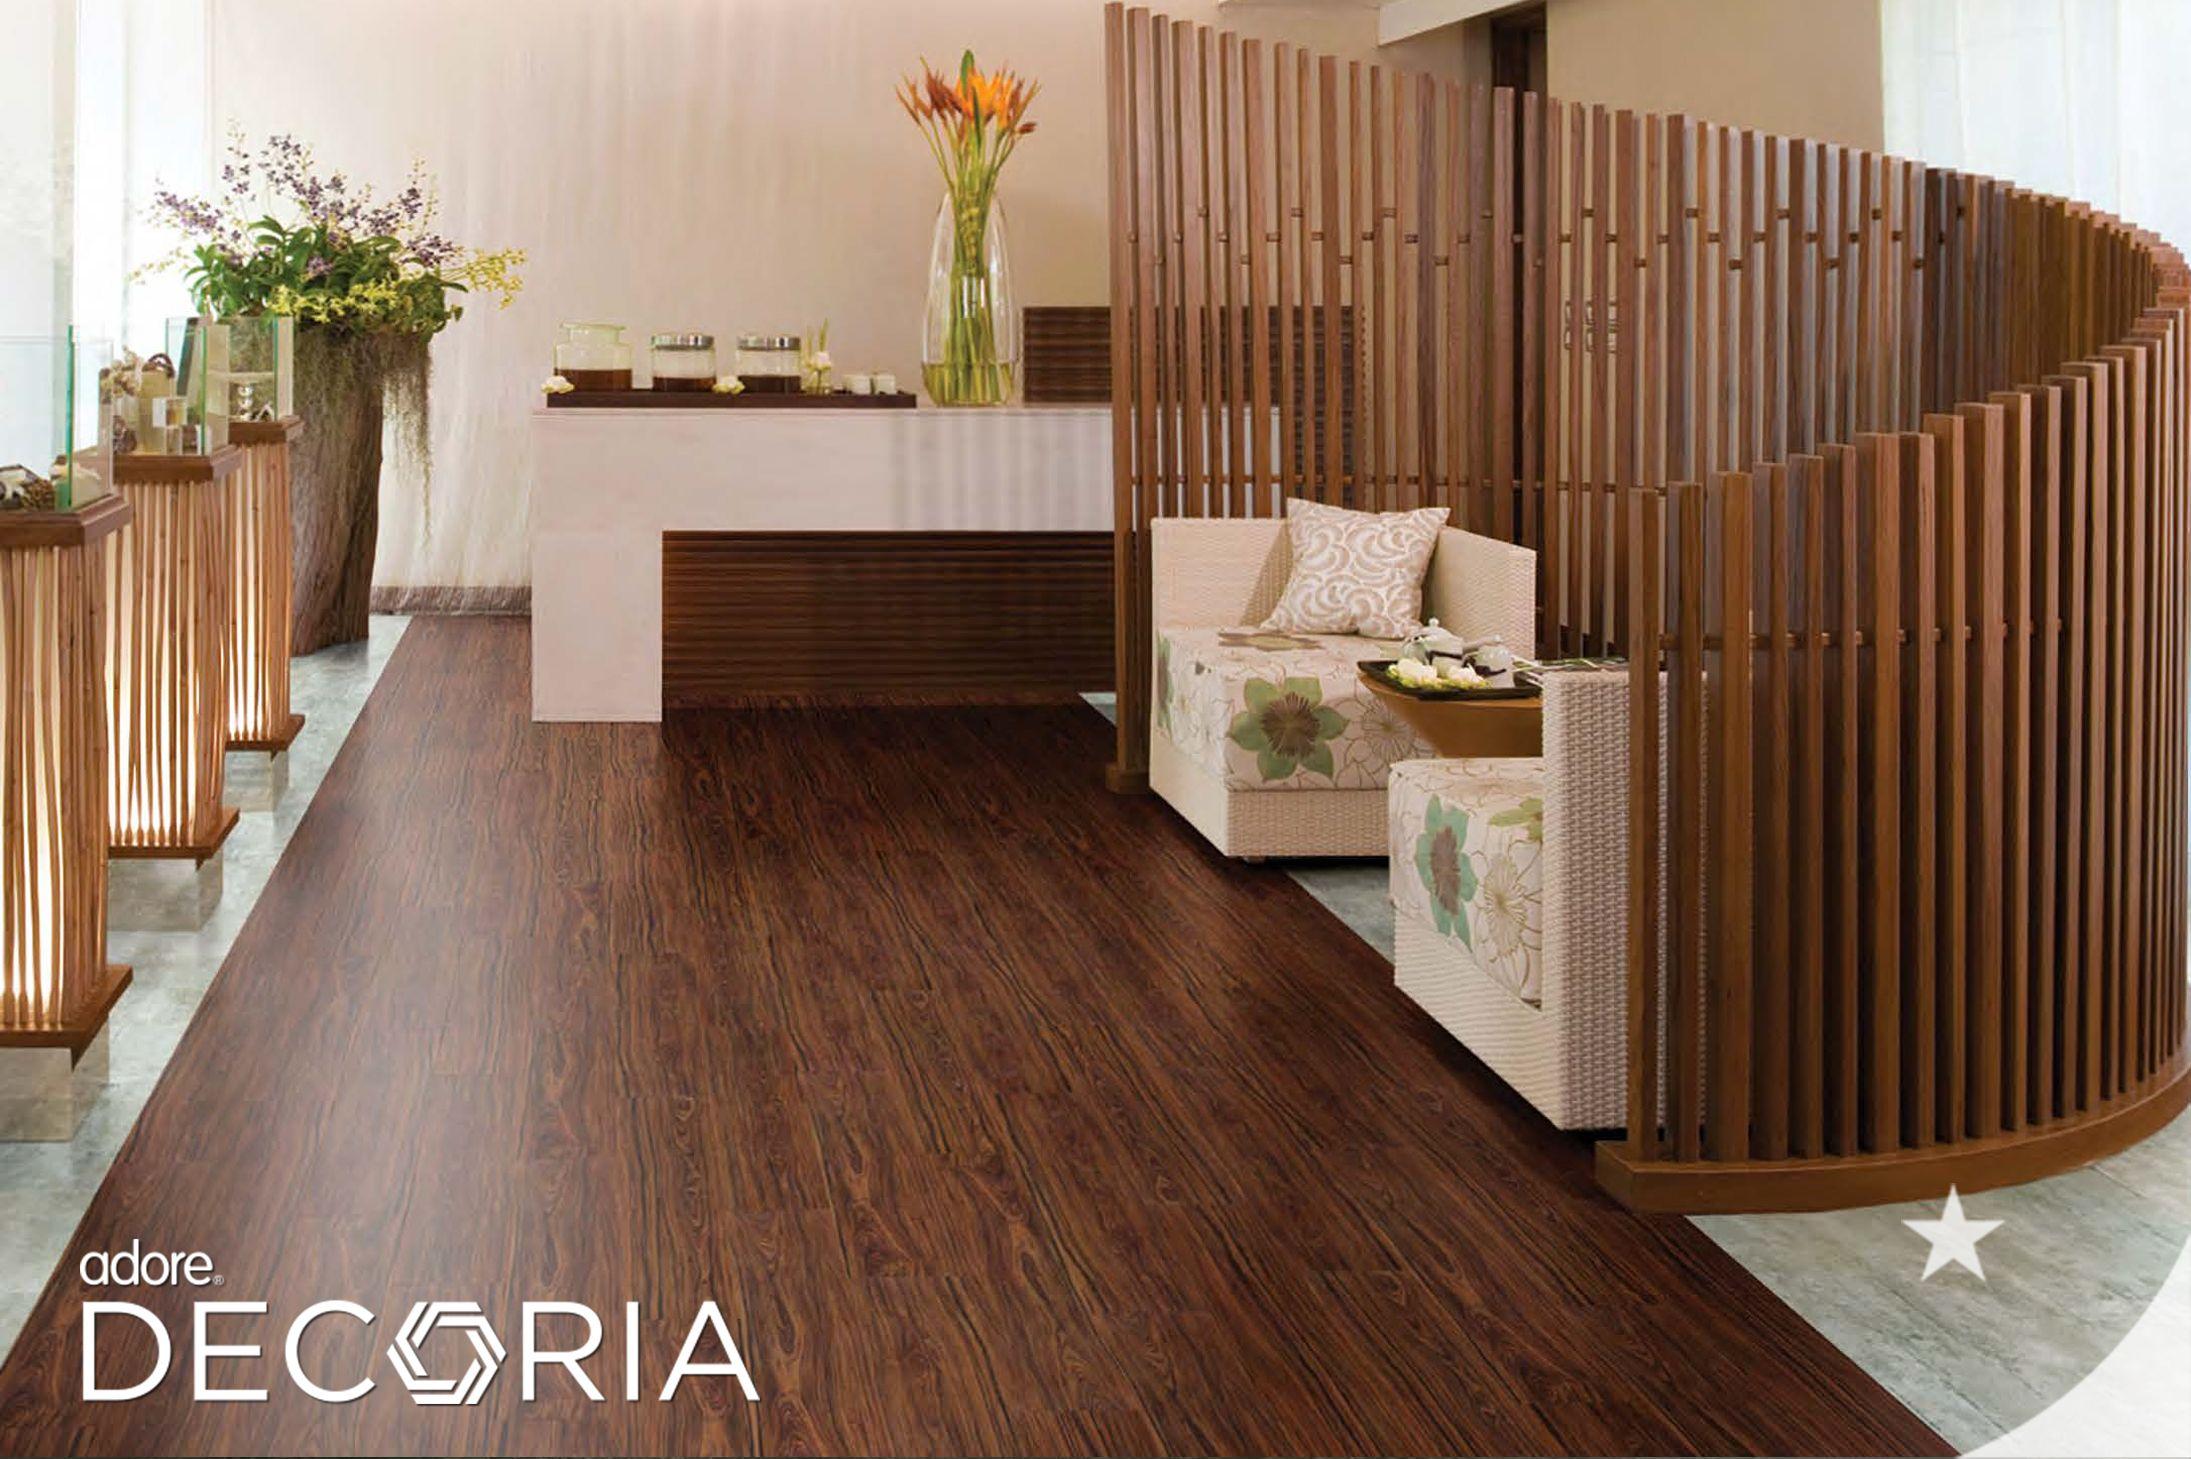 Adore Decoria Luxury Vinyl Flooring On Sale Save 30 60 Diy Doityourself Home Design Vinyl Luxury Vinyl Flooring Vinyl Flooring Luxury Vinyl Plank